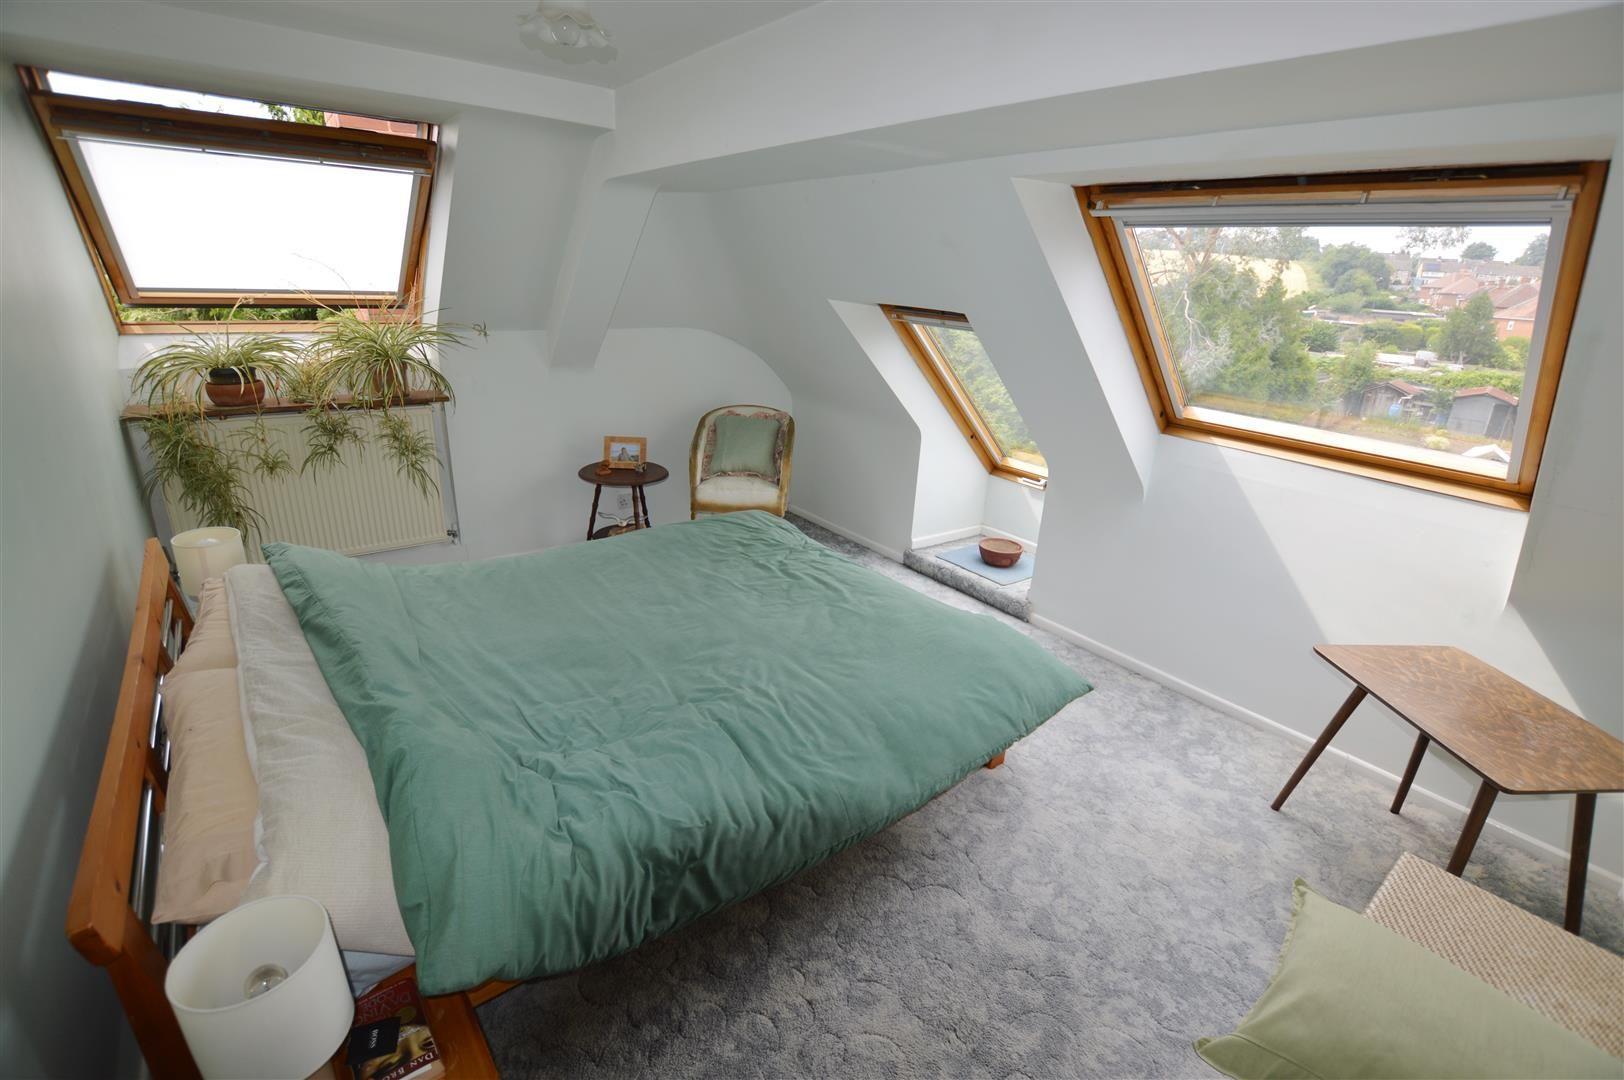 6 bed detached for sale in Leominster  - Property Image 8